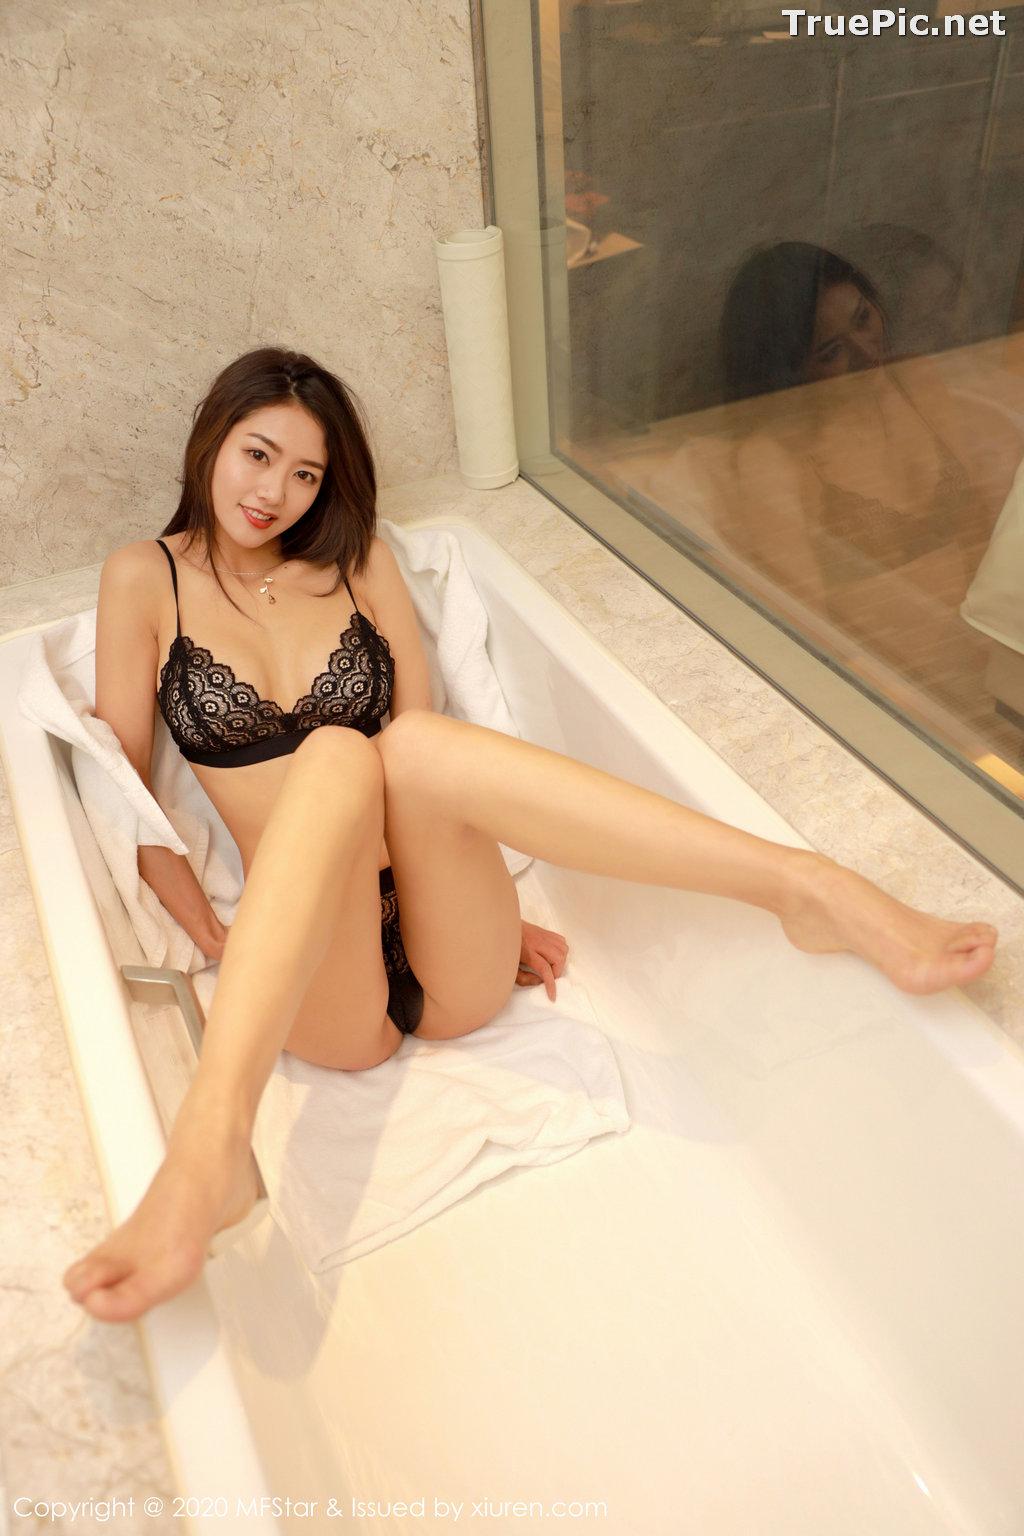 Image MFStar Vol.307 - Chinese Model - Fang Zi Xuan (方子萱) - TruePic.net - Picture-10